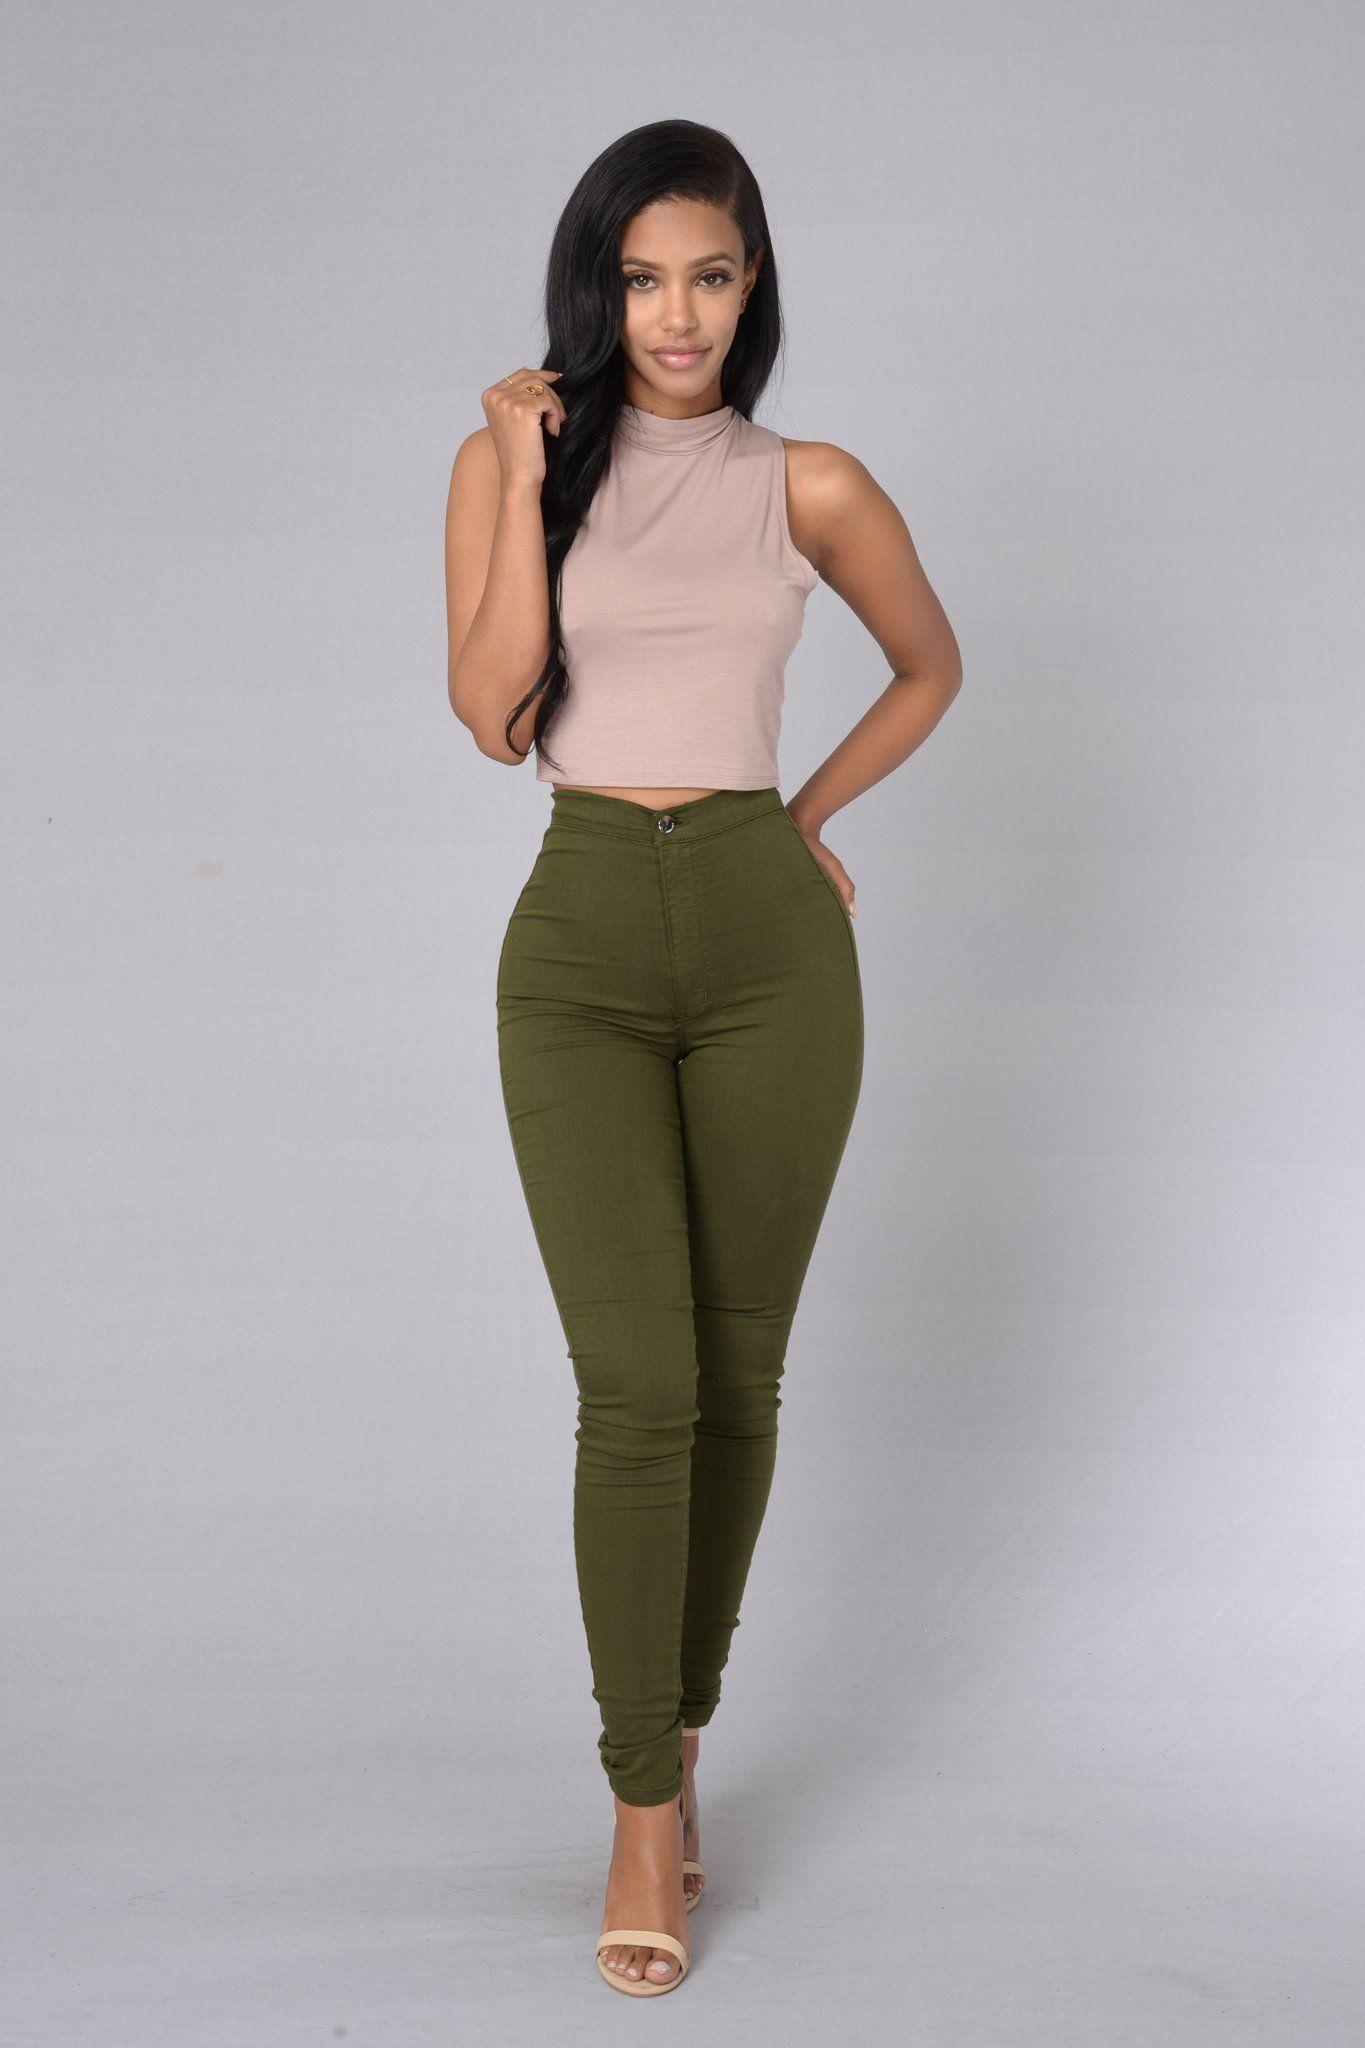 b3608ba5eaeb Super High Waist Denim Skinnies - Olive   Outfits   High jeans, High ...